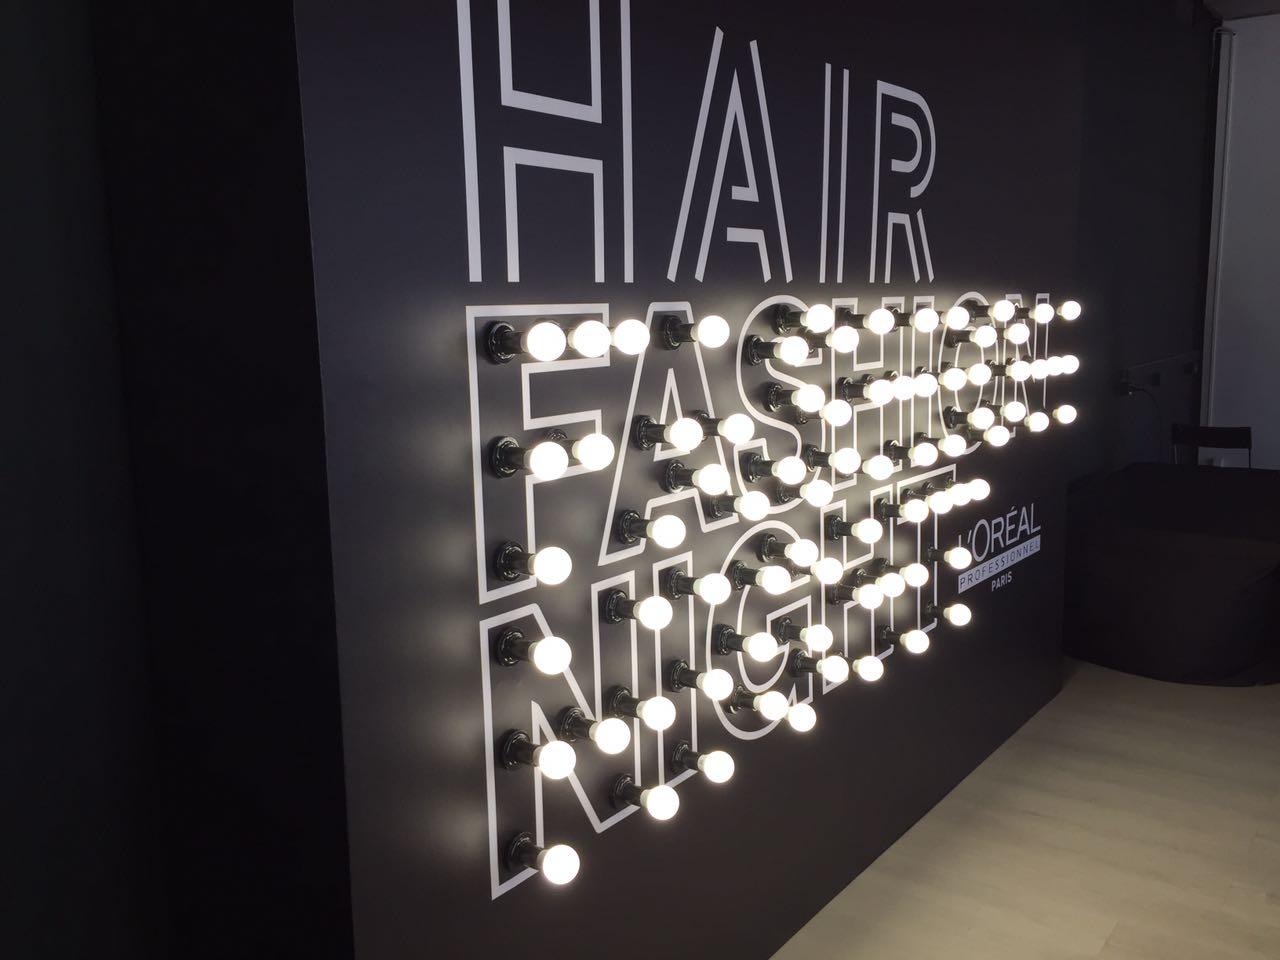 Haire fashion night